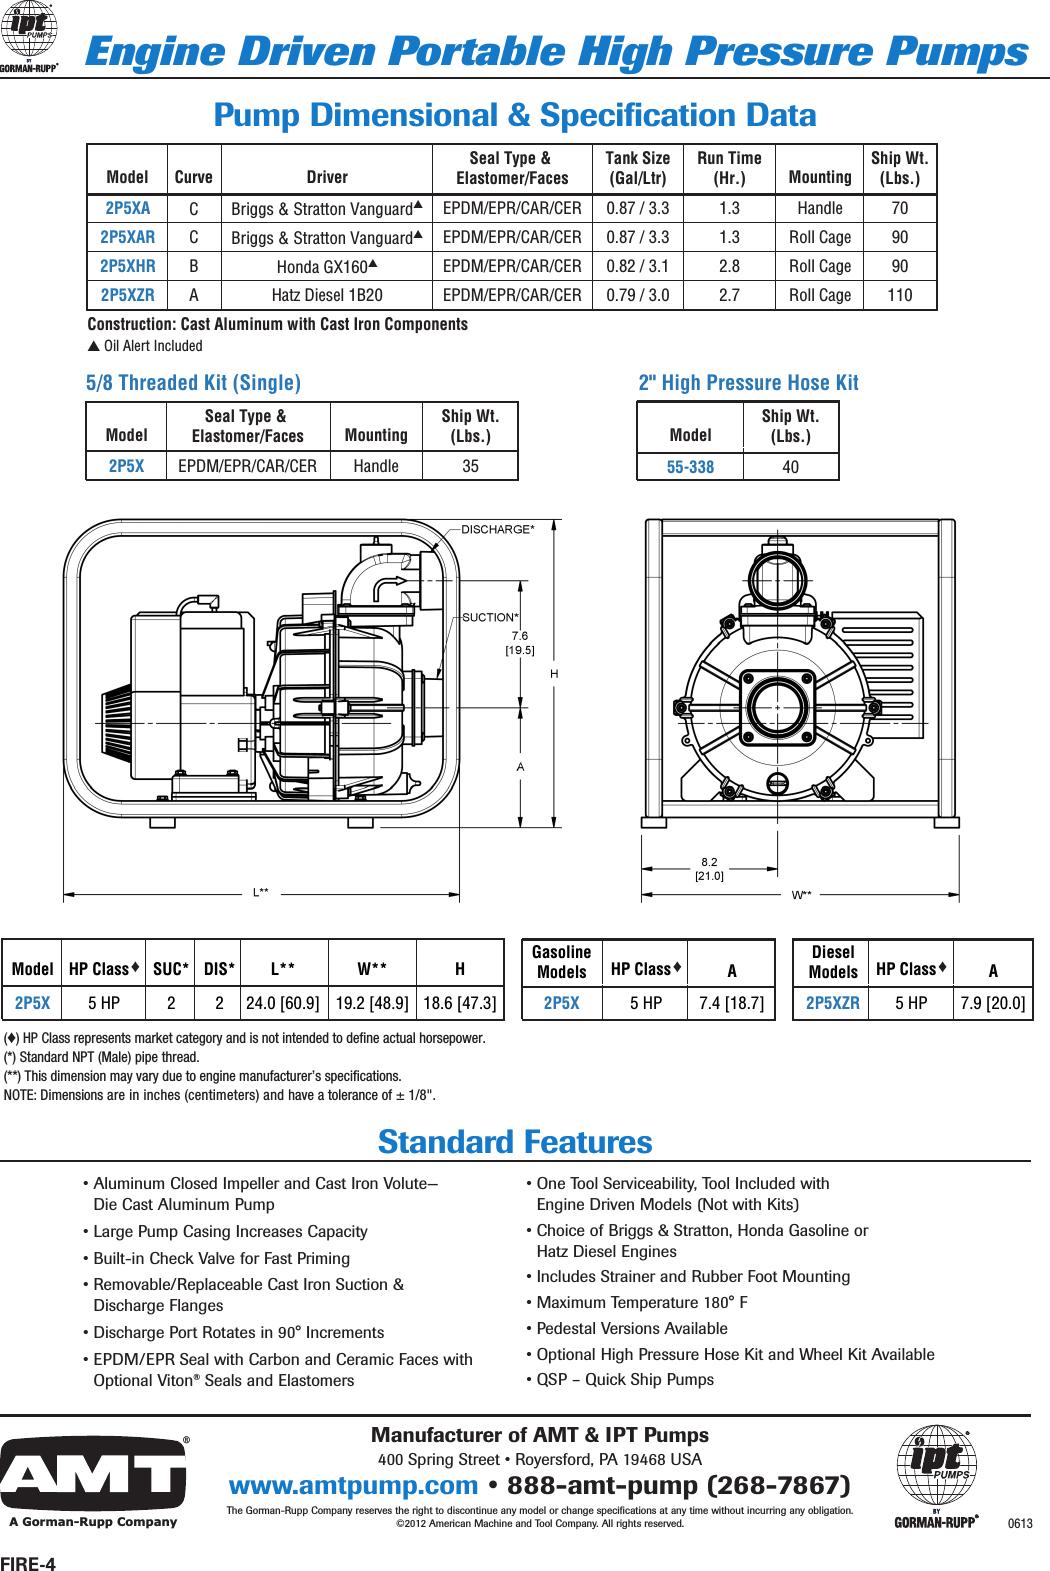 537111 1 Amt 2 Inch Portable High Pressure Pump Brochure User Manual